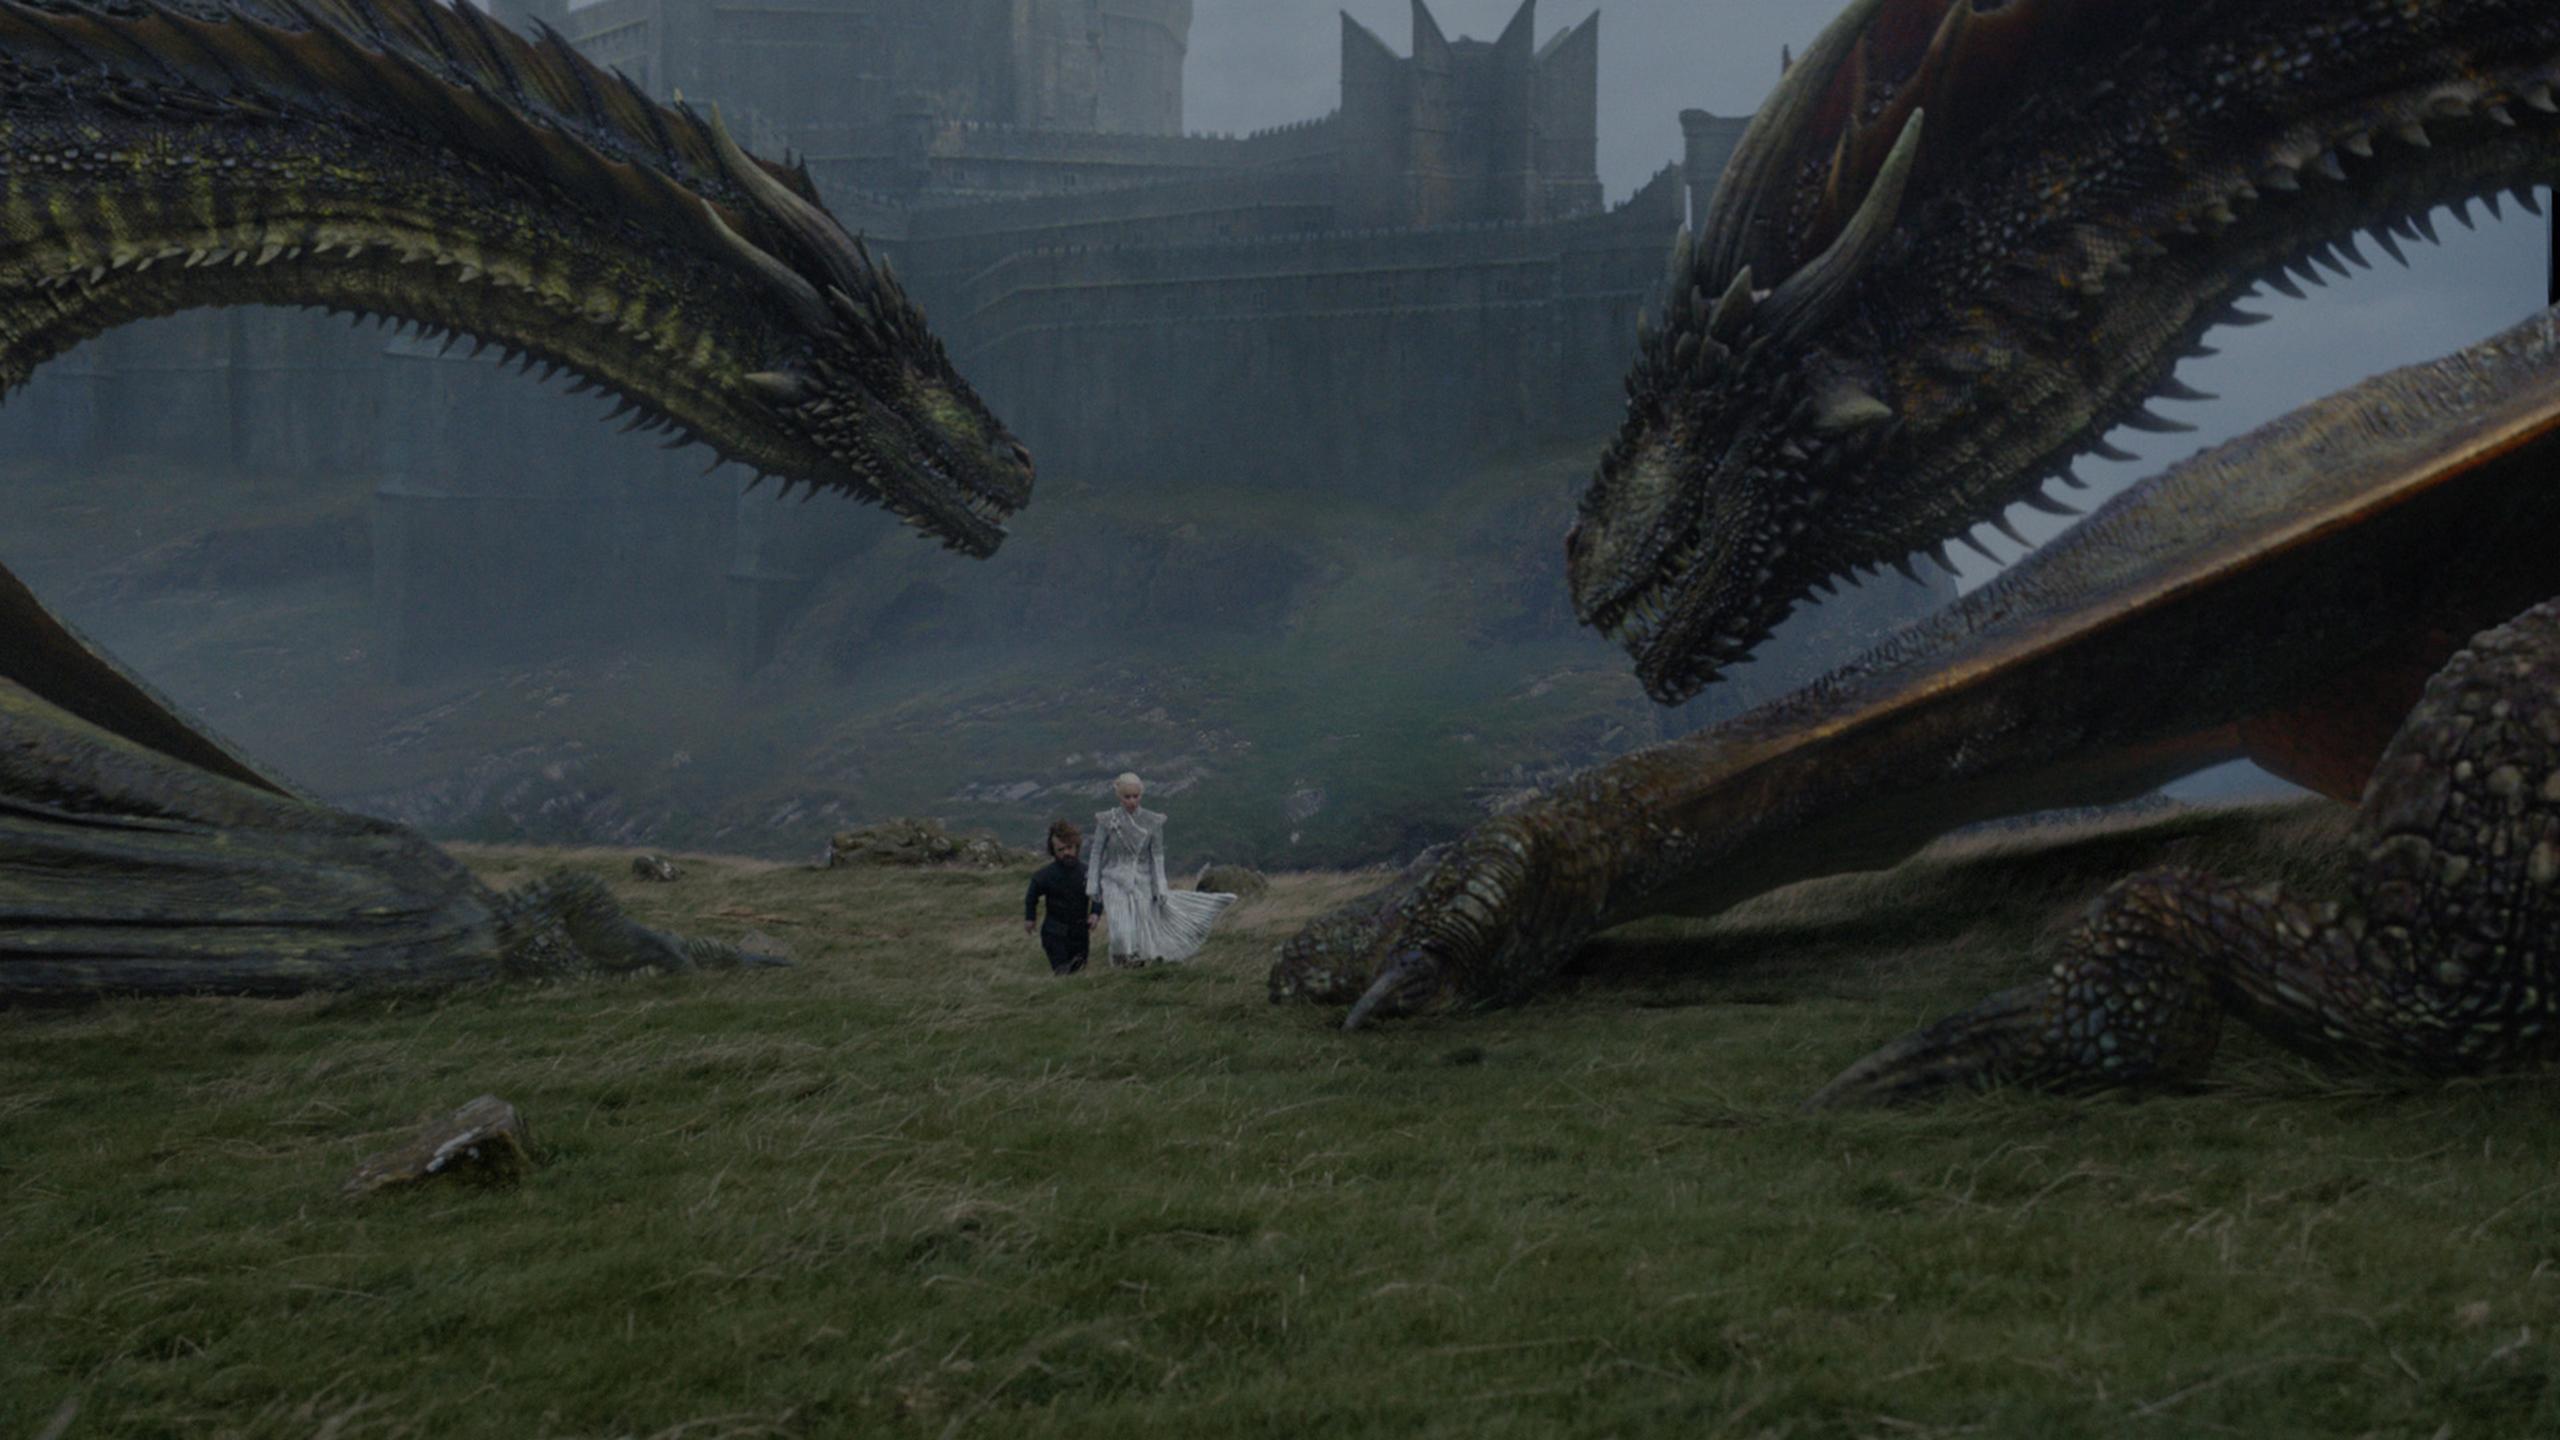 Free Download Top 40 Game Of Thrones Wallpaper Got